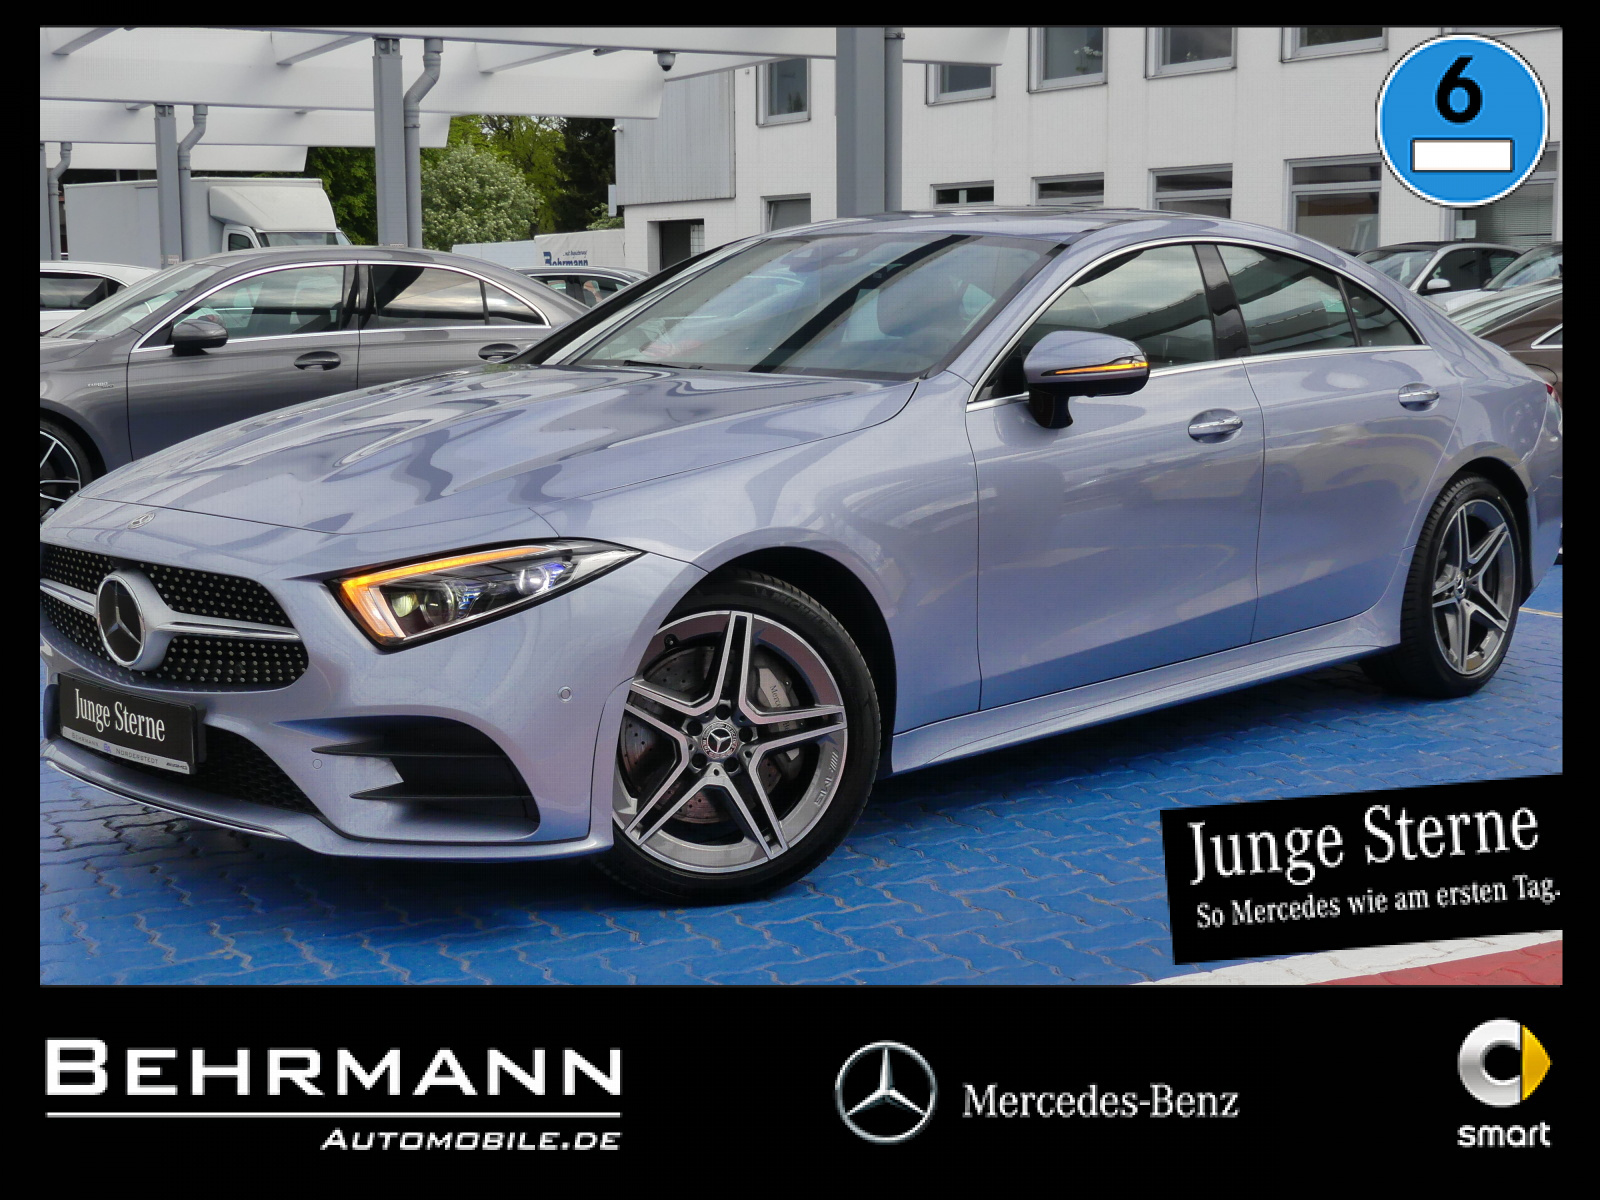 Mercedes-Benz CLS 450 AMG 4M +Distronic+360°Kam+MultibeamLED++, Jahr 2020, Benzin